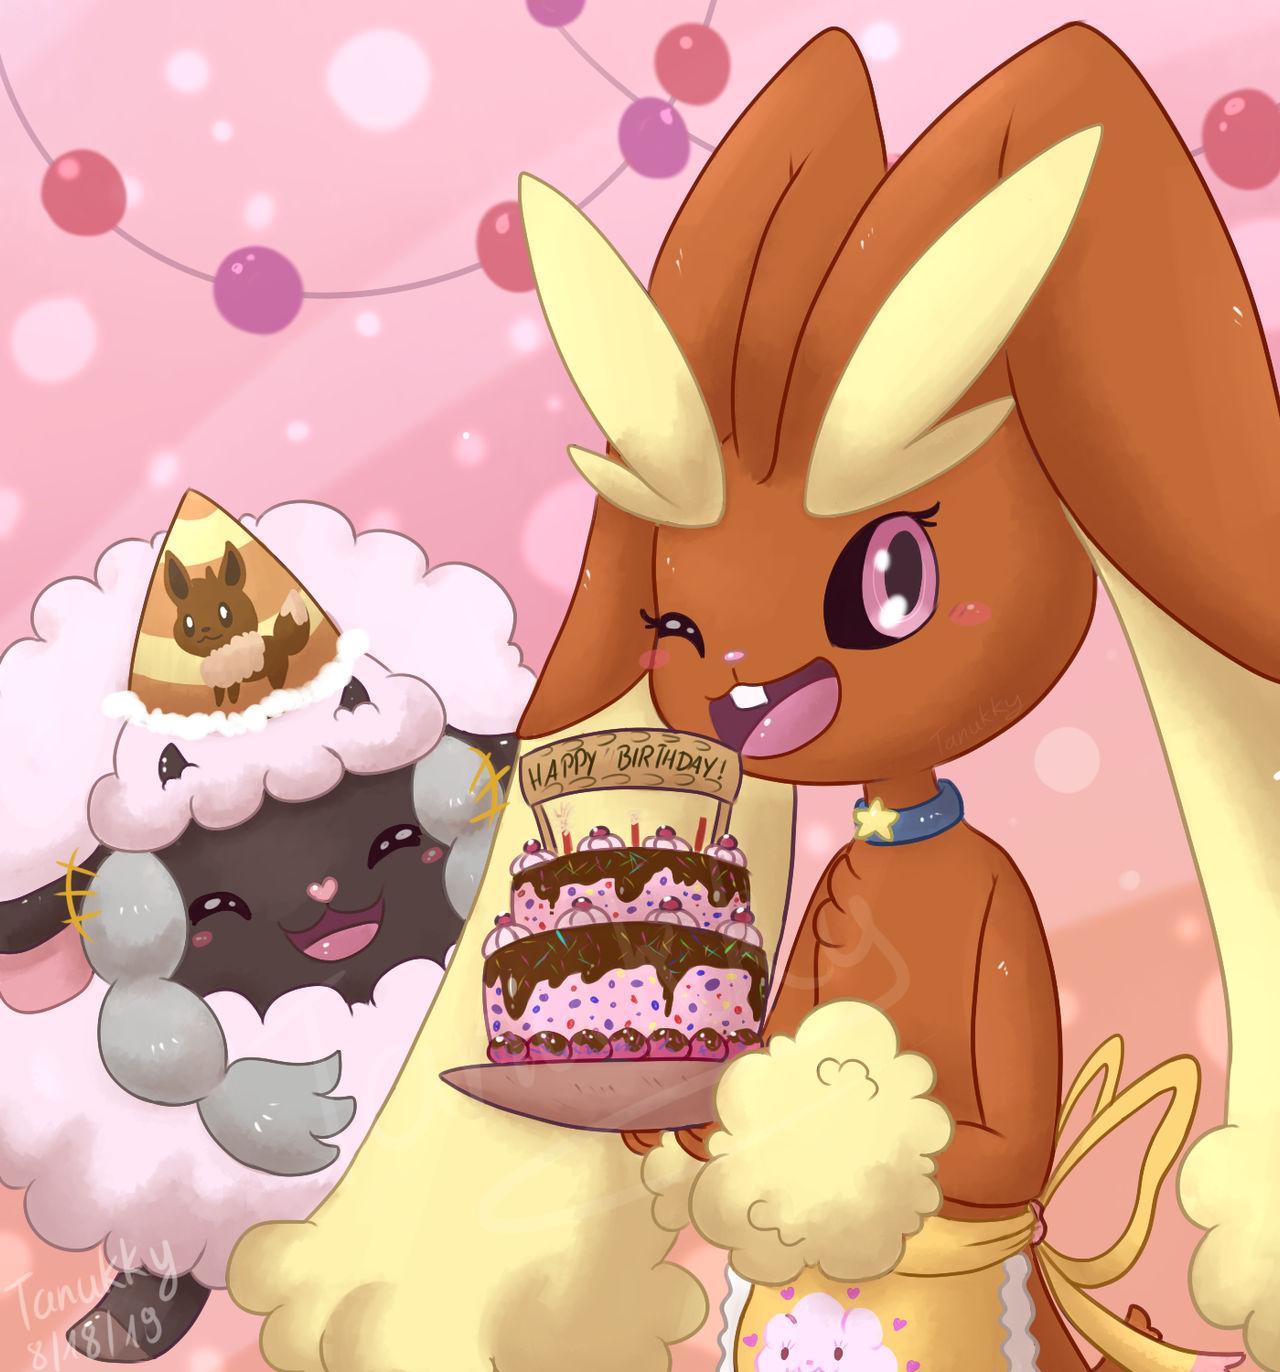 Birthday cake [AT]